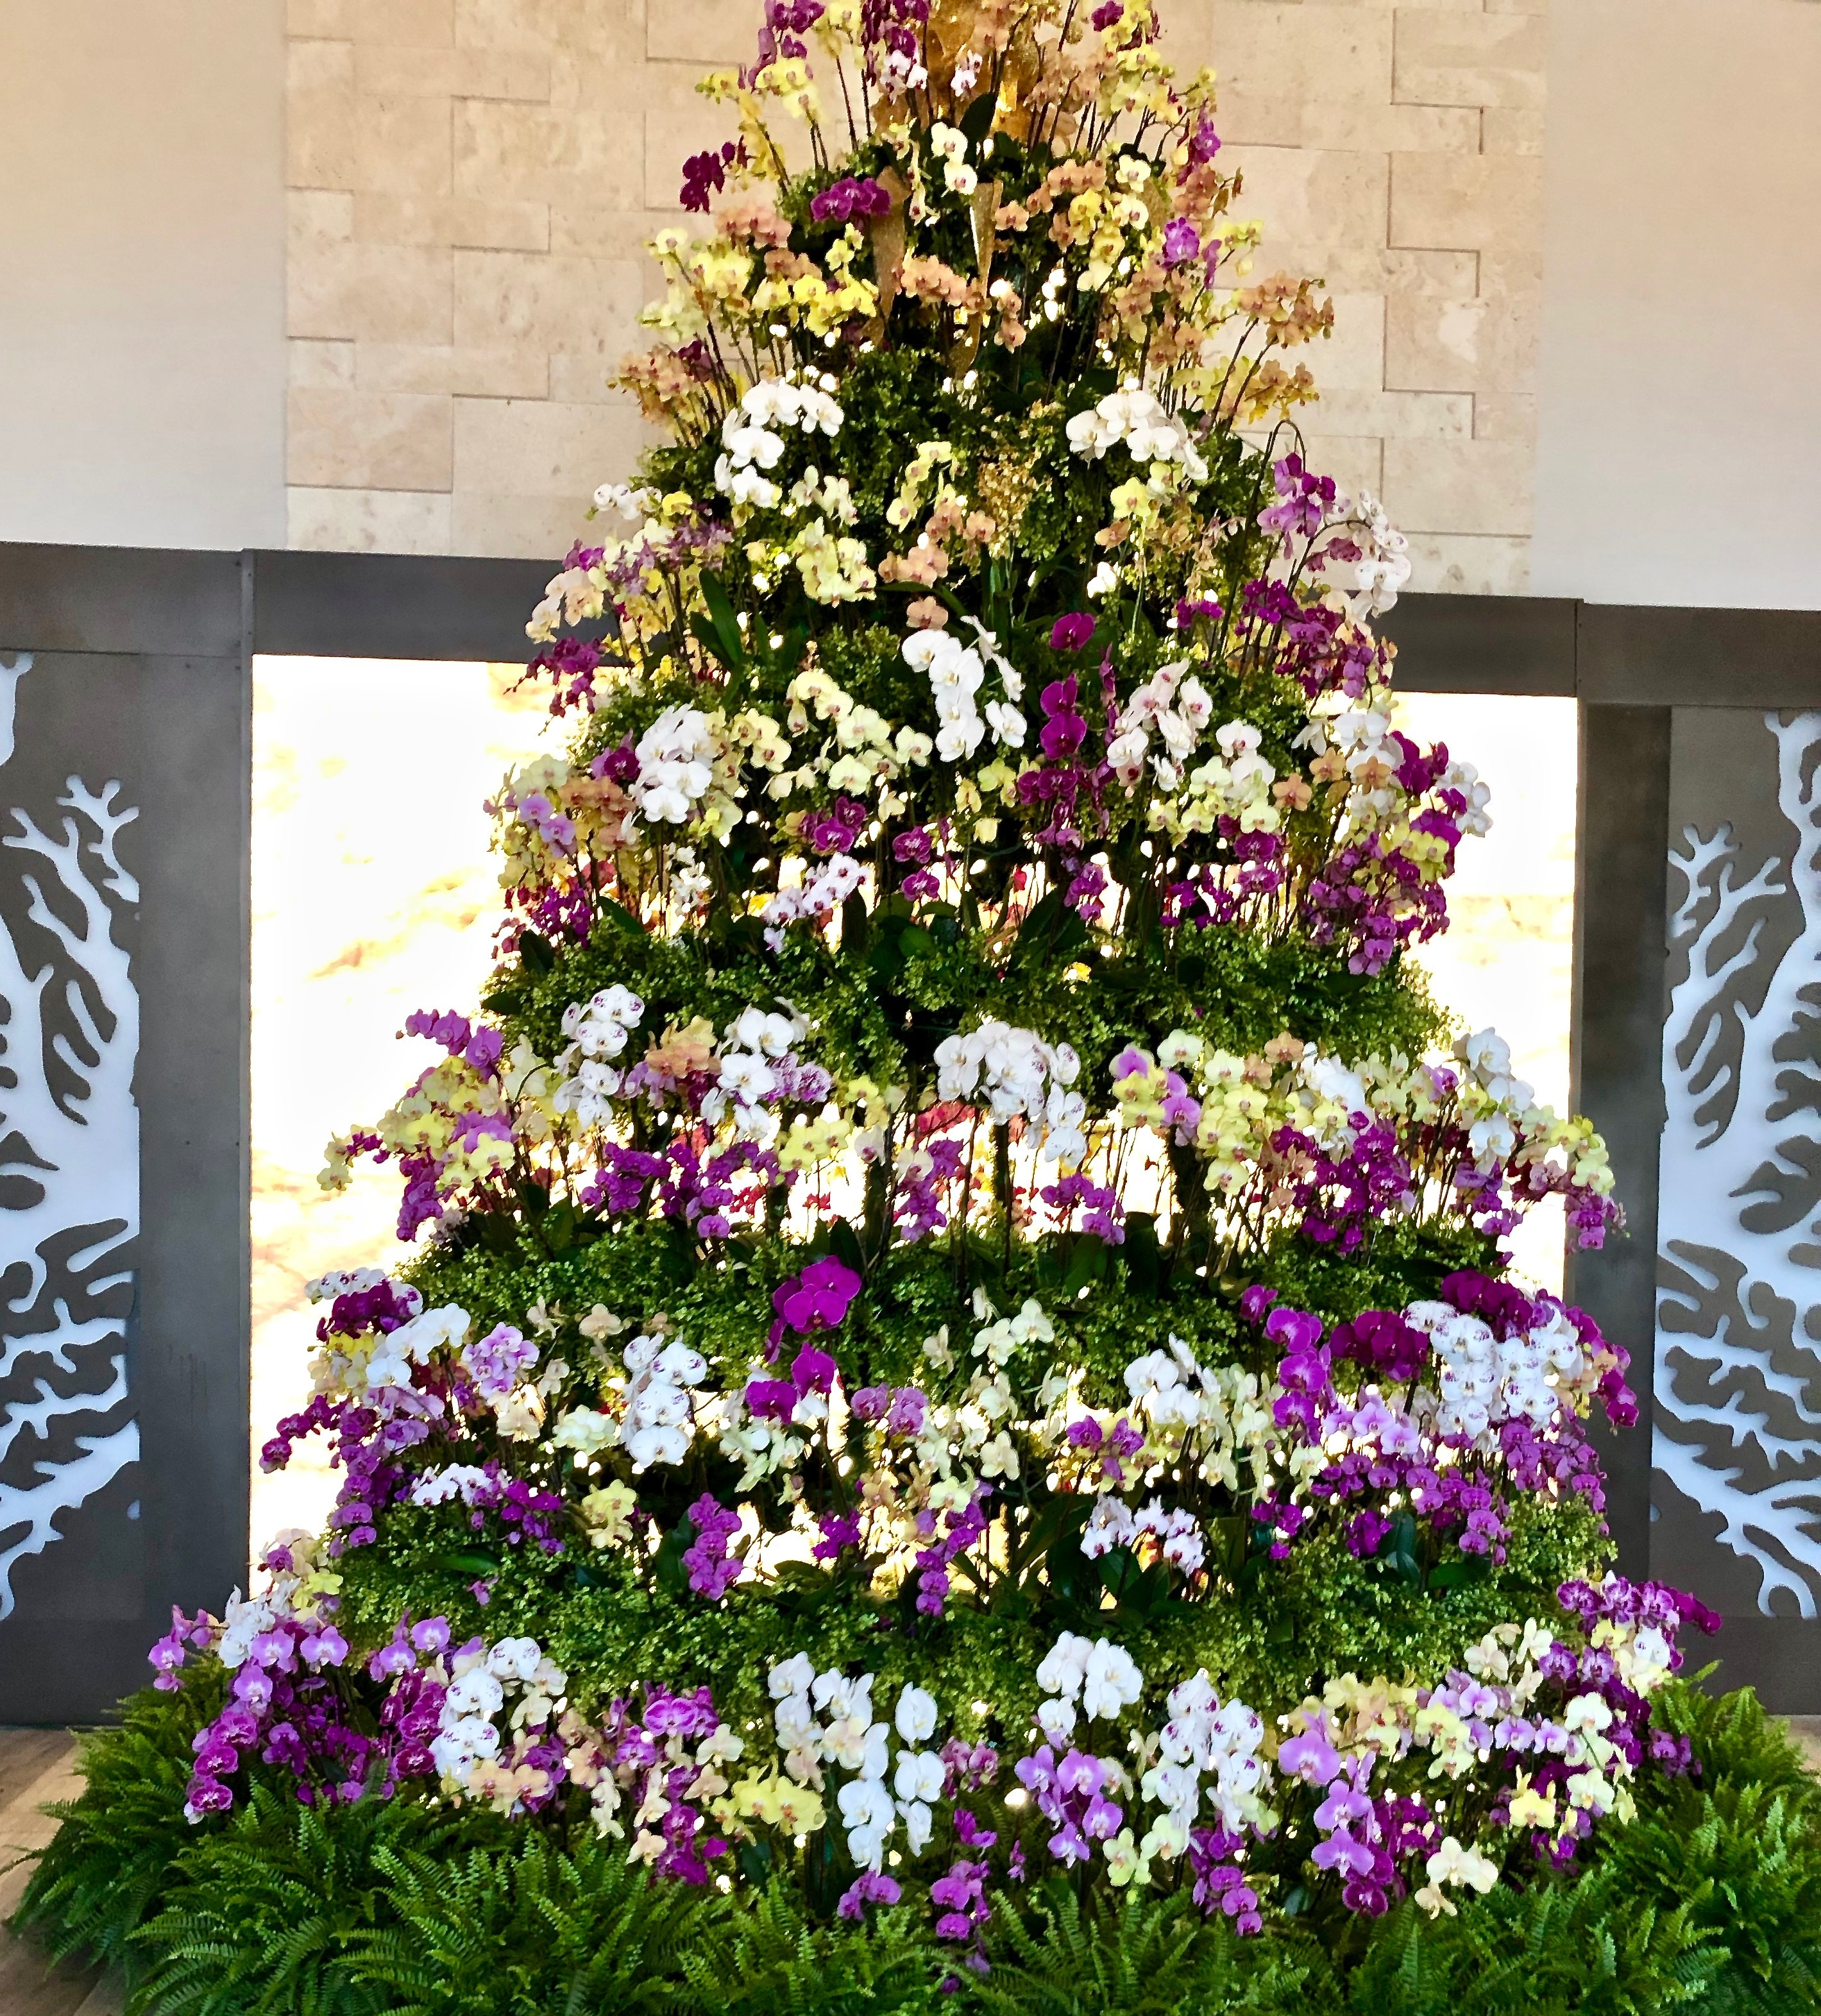 Orchid Christmas Tree.Wordfull Wednesday Key Largo Christmas Orchid Tree